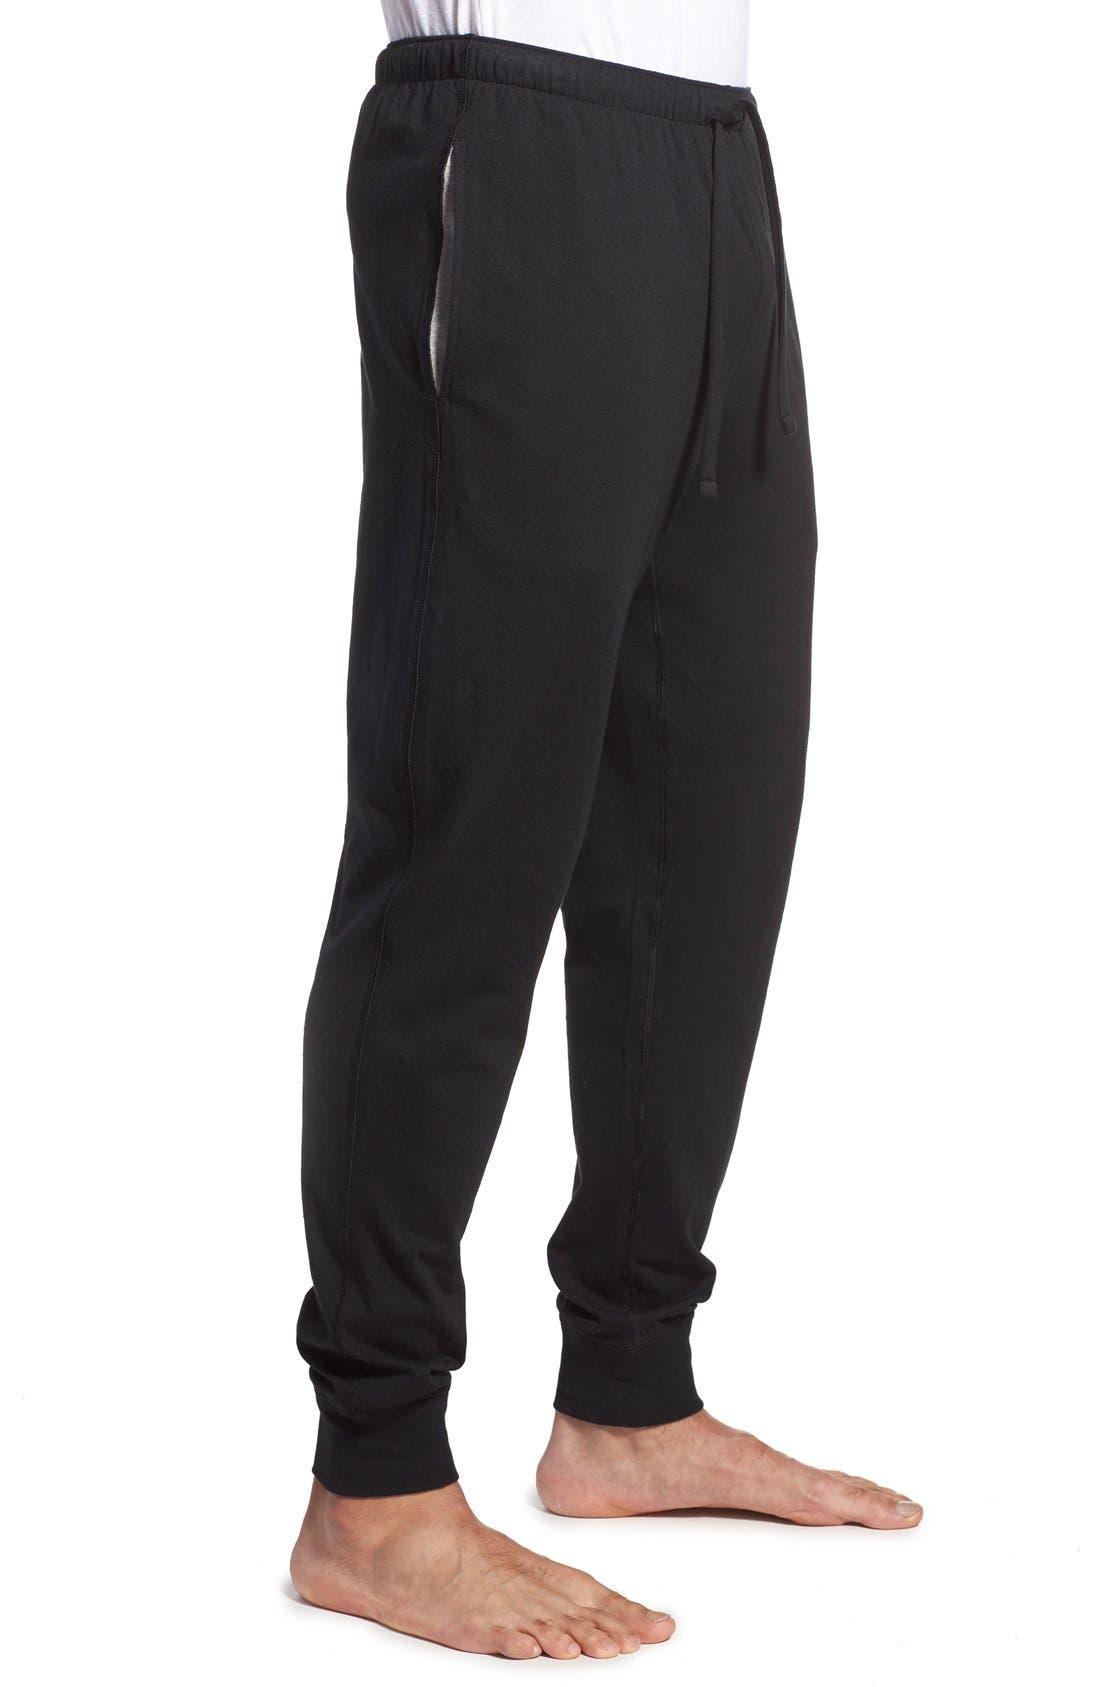 POLO RALPH LAUREN, Relaxed Fit Cotton Knit Lounge Jogger Pants, Alternate thumbnail 4, color, BLACK